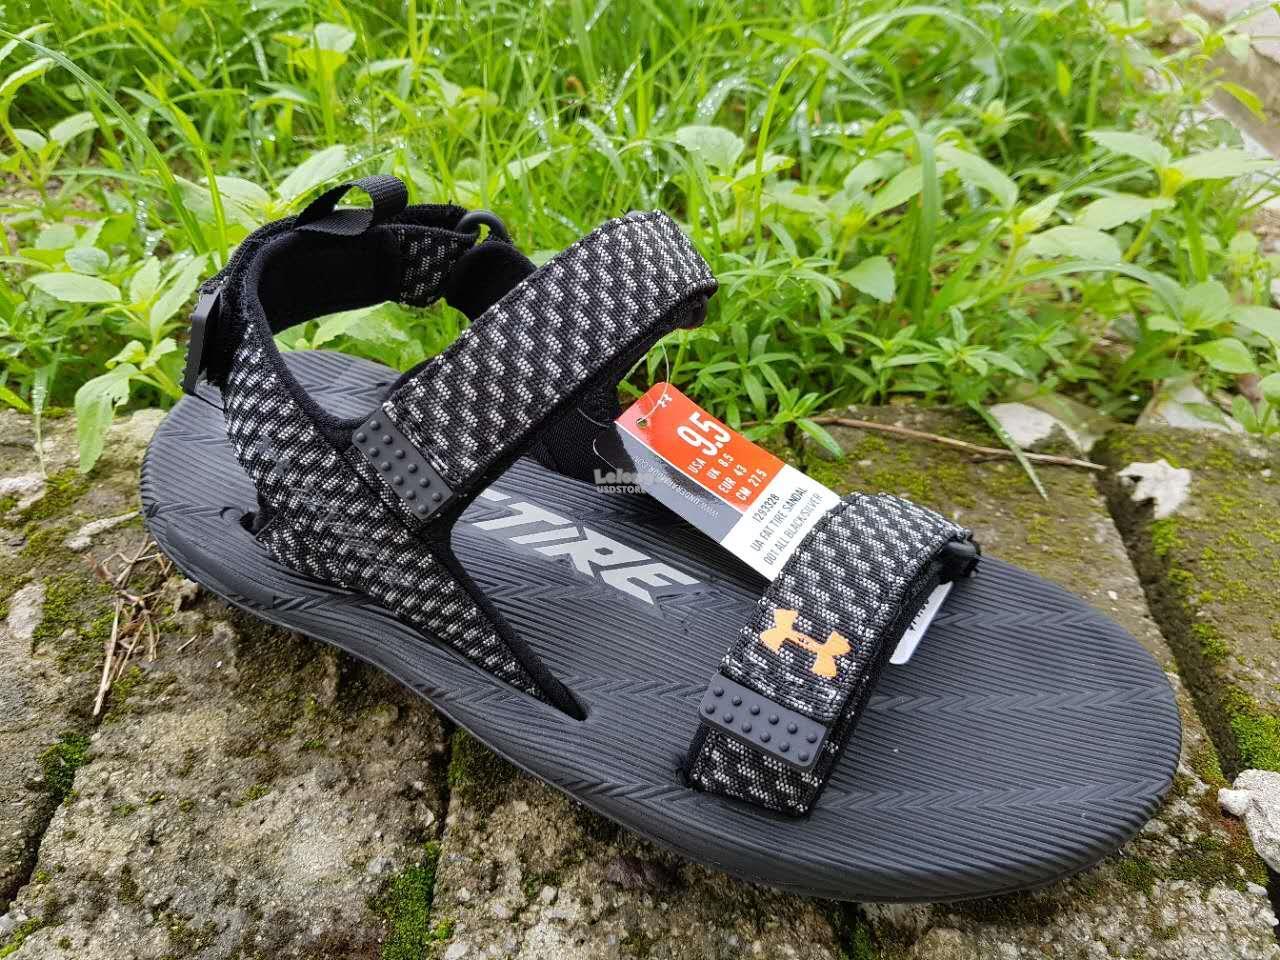 cdf993a827b4 Under Armour Fat Tire Sandals (end 7 3 2019 11 15 AM)